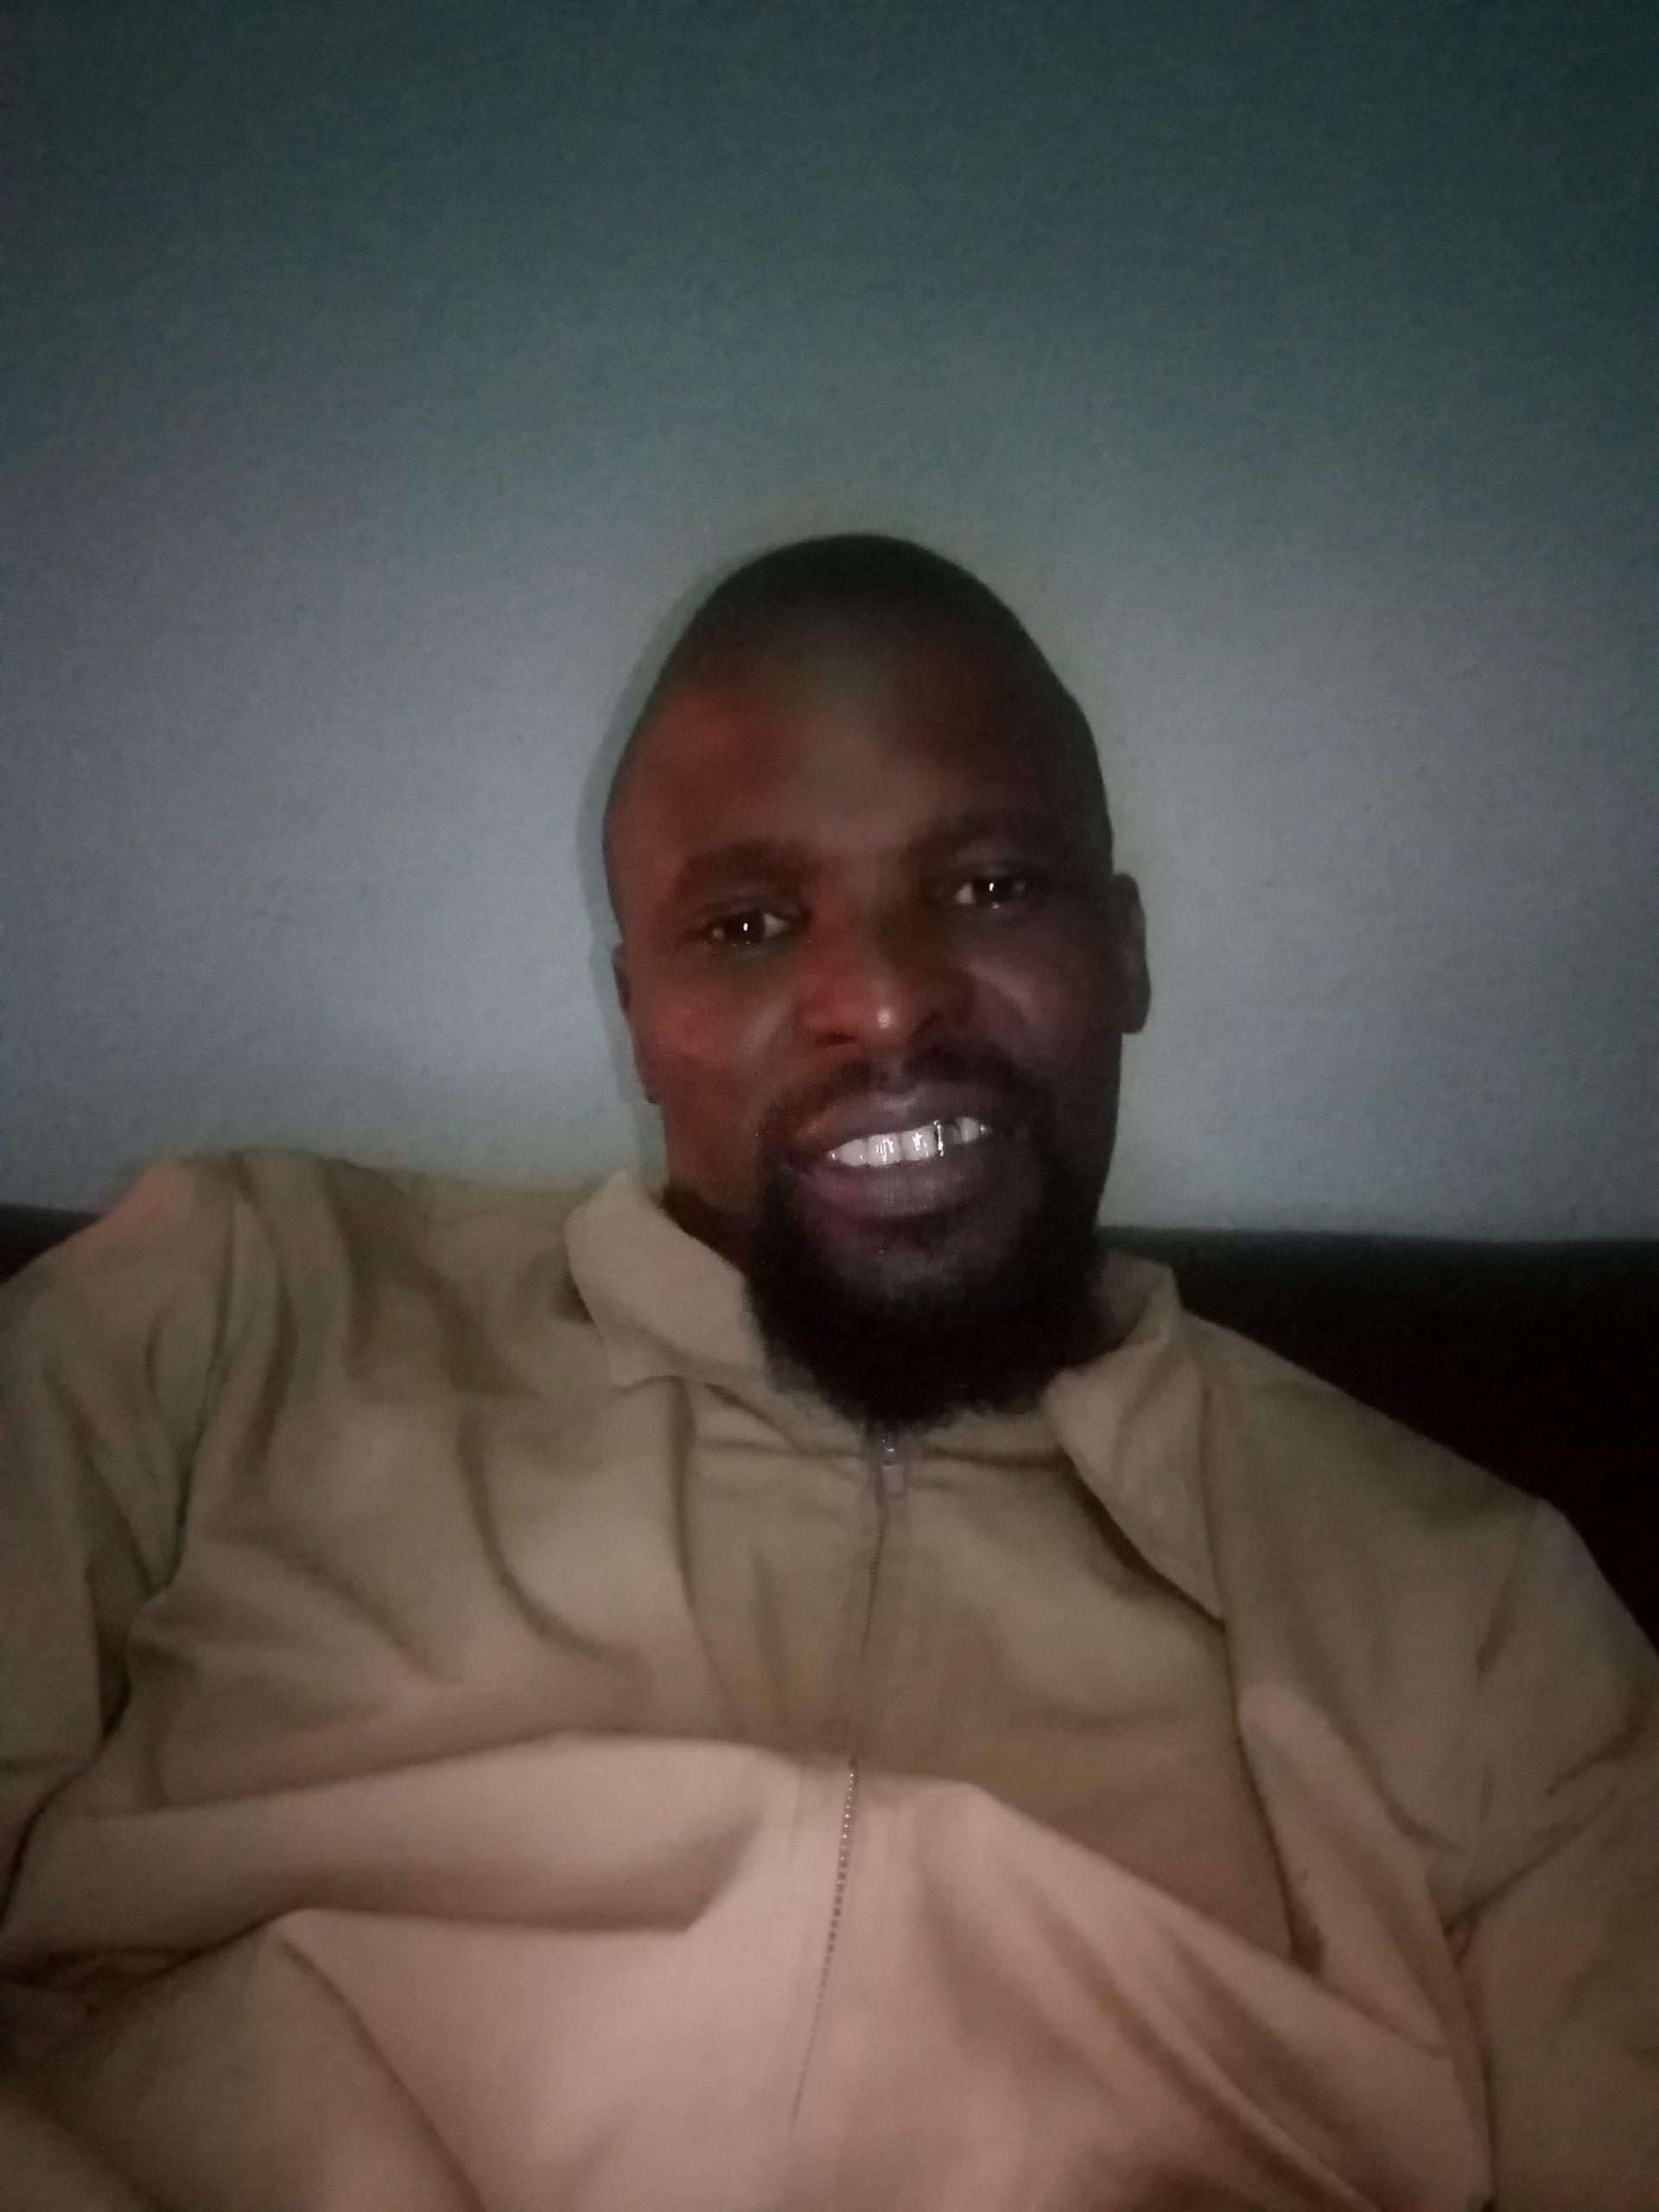 Fanuel Nkomo, Simunye youth Development, Johannesburg, South Africa & Zimbabwe